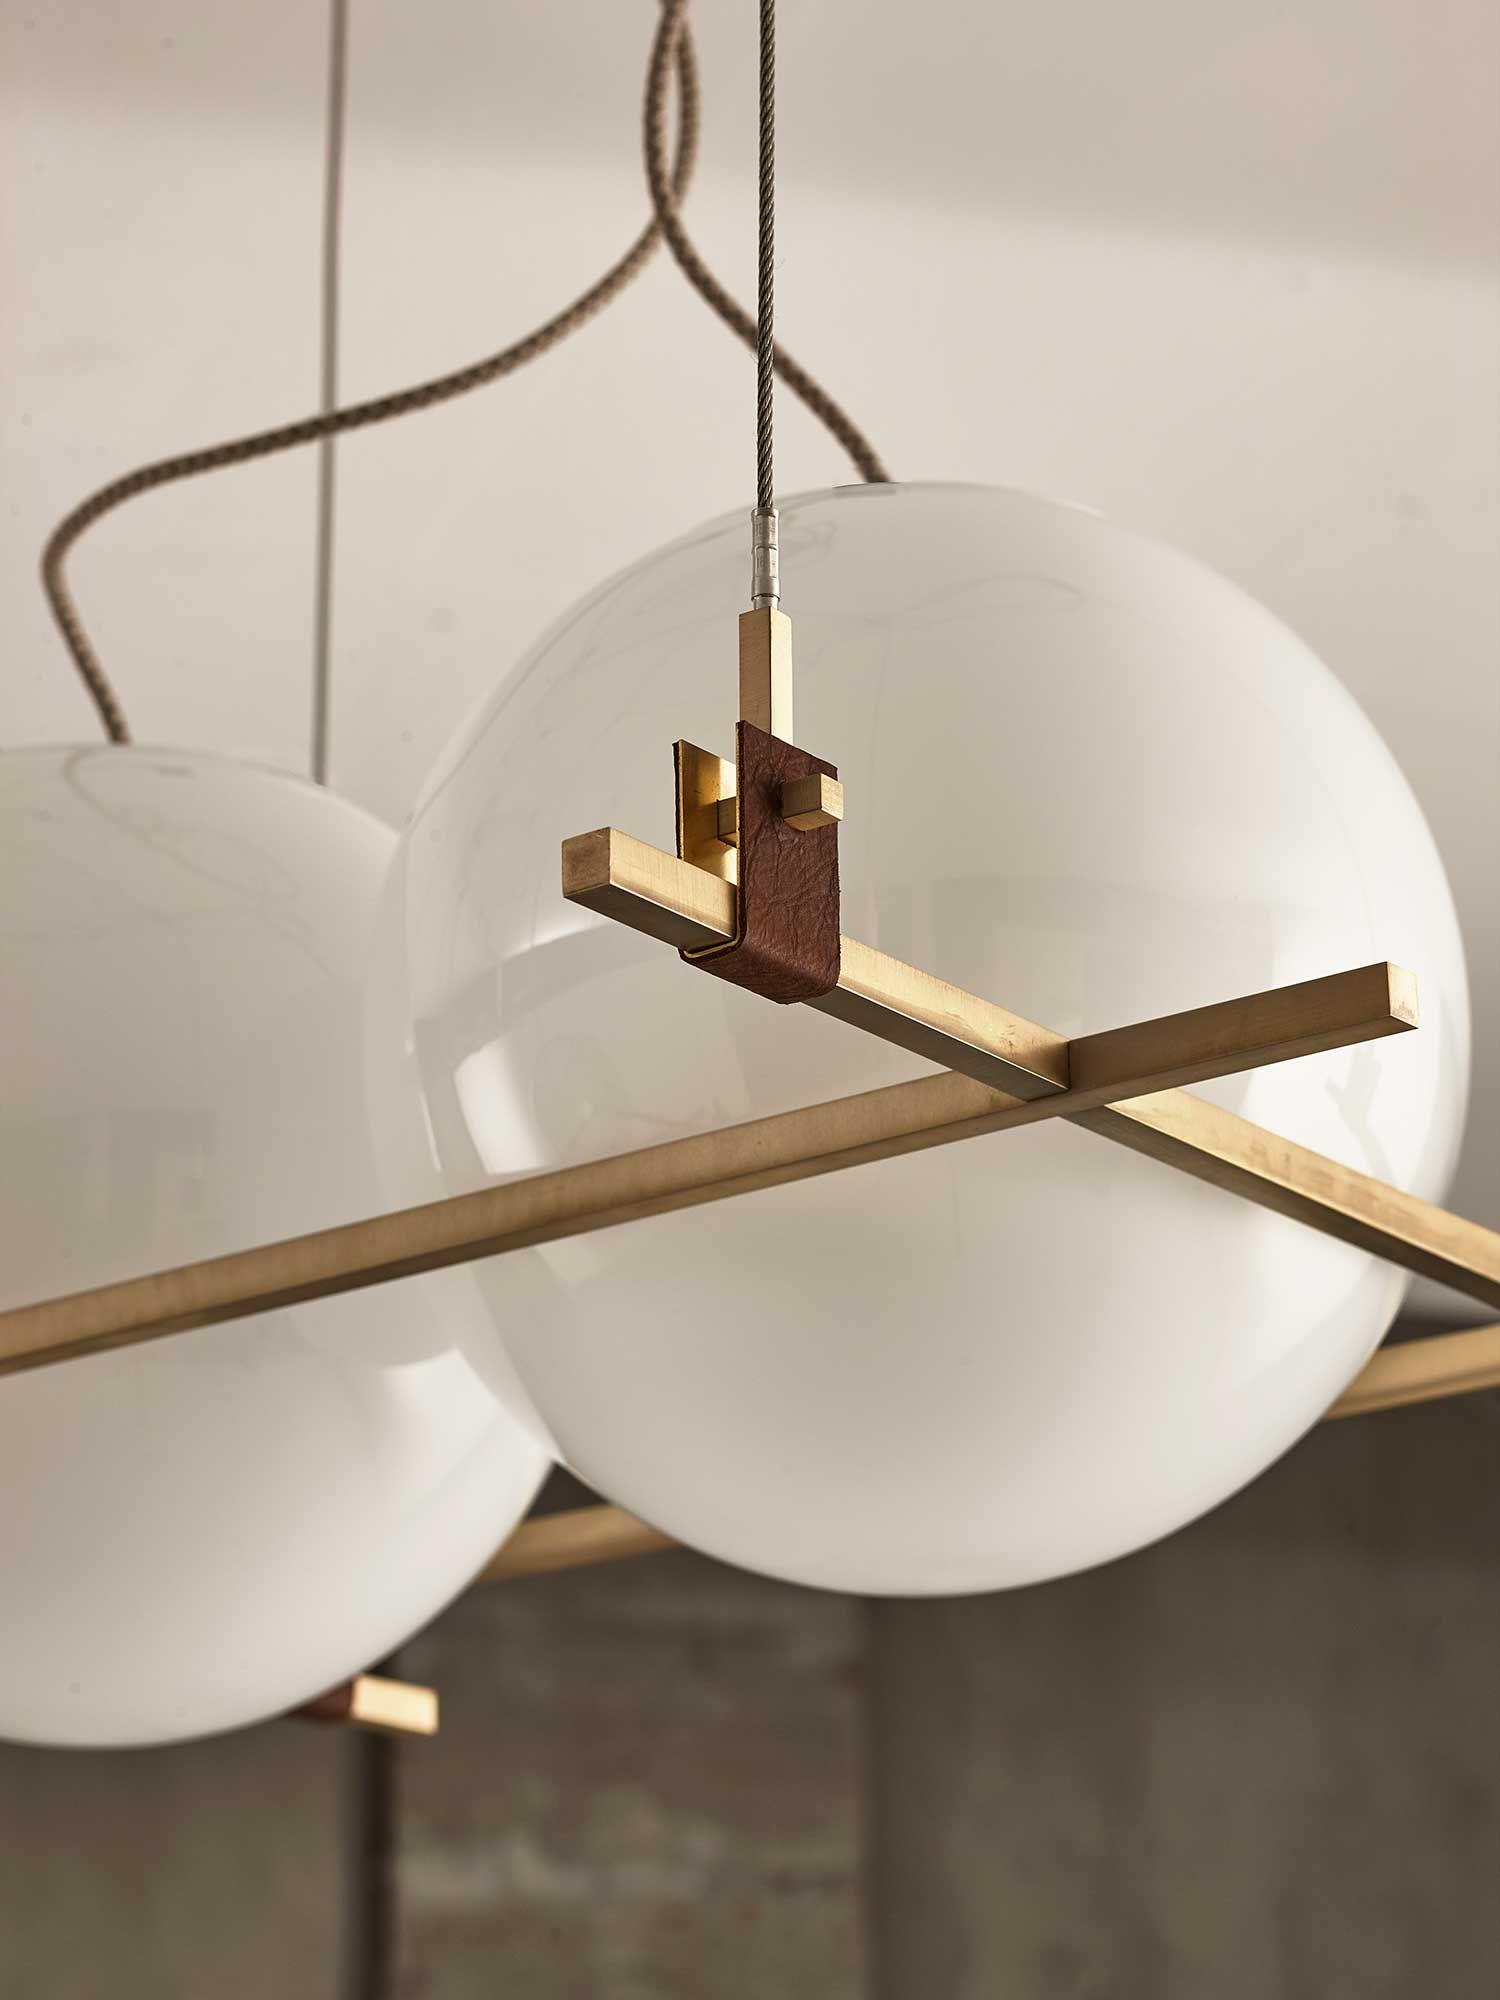 Federico peri light milantrace2015 by yellowtrace - Articulos iluminacion ...